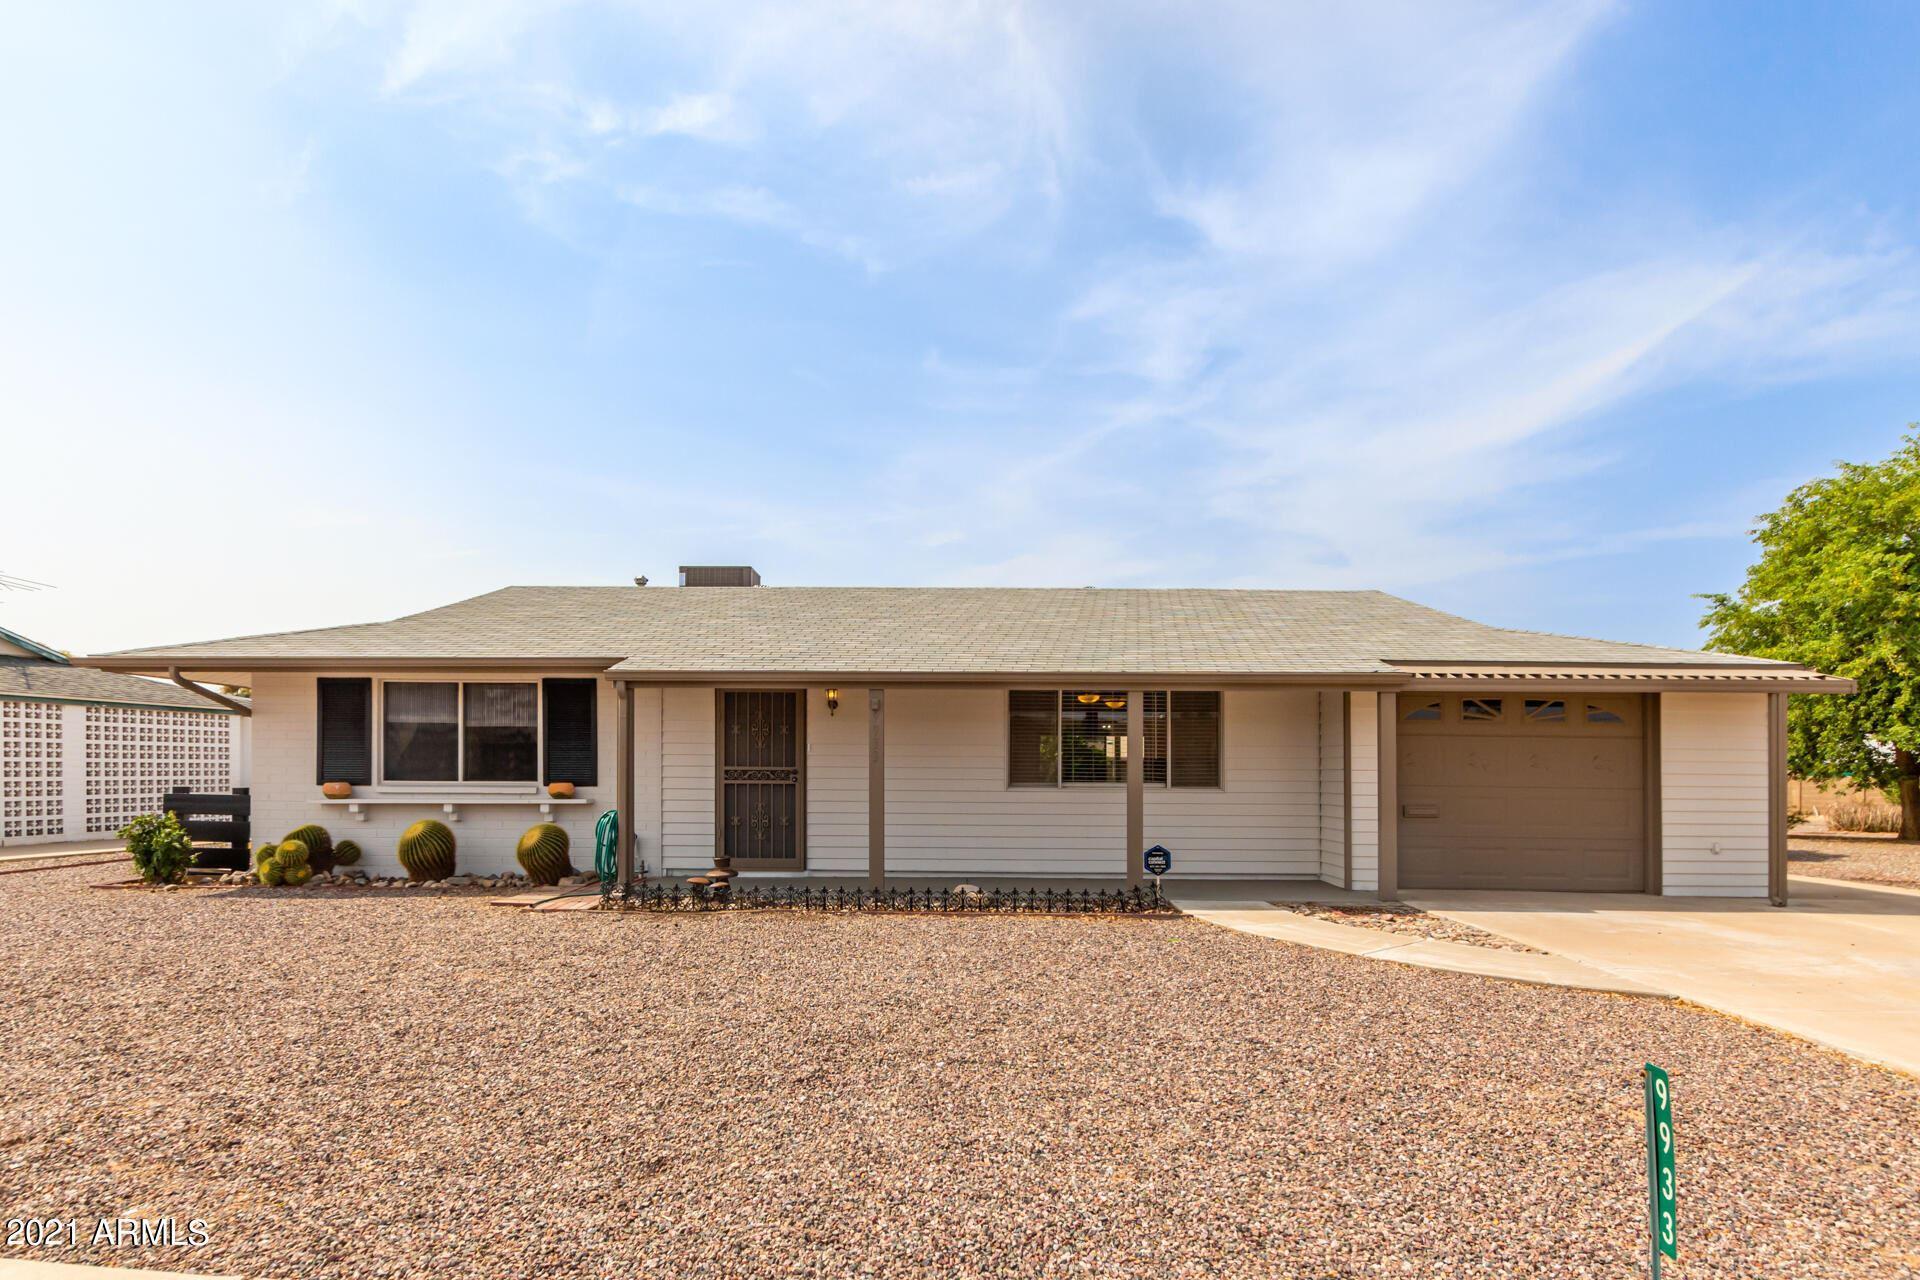 9933 W PINEHURST Drive, Sun City, AZ 85351 - MLS#: 6270083